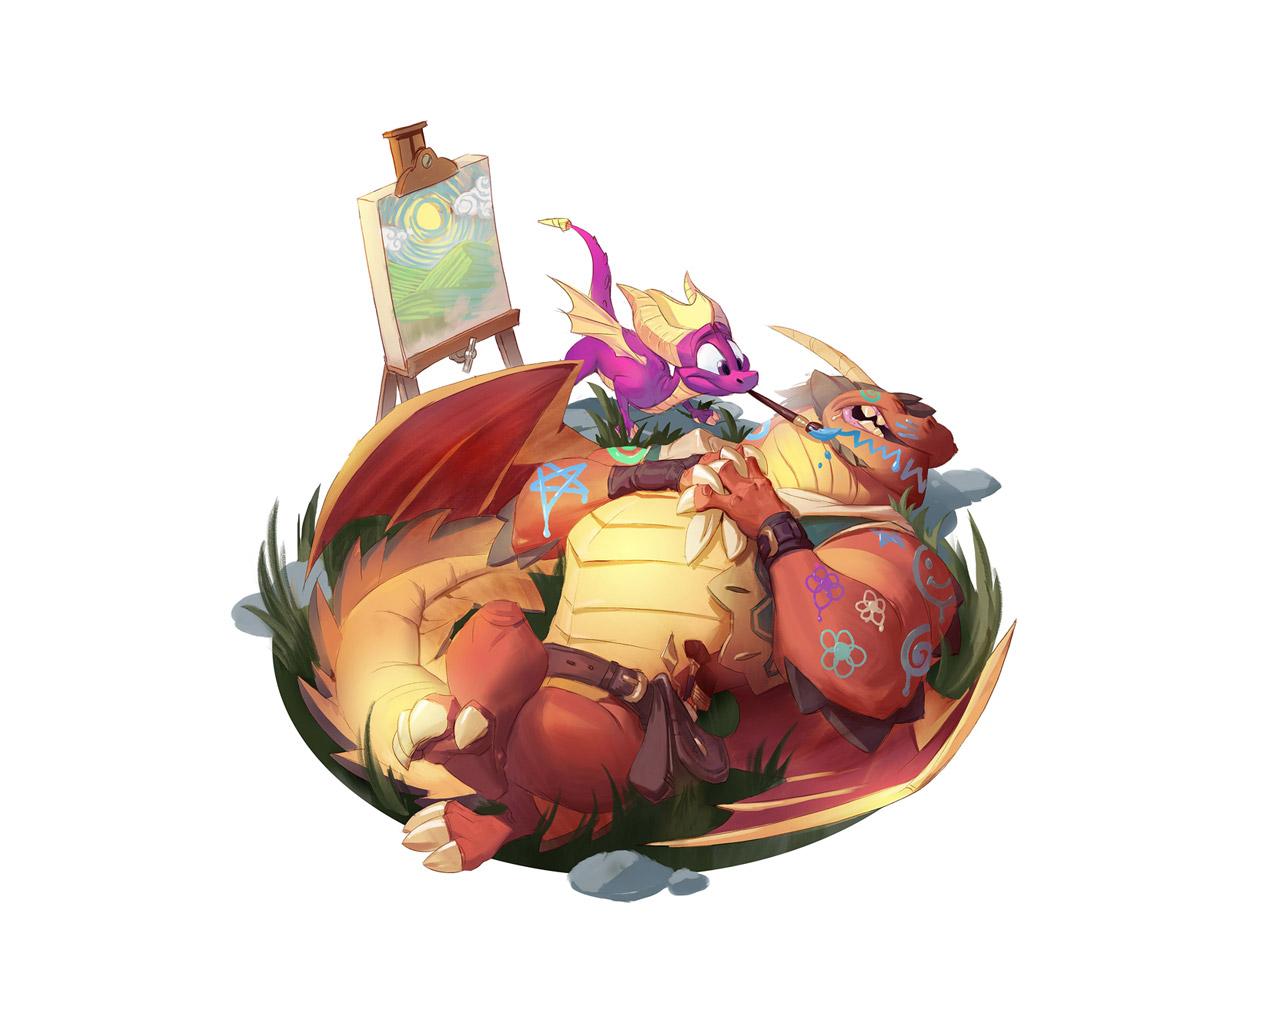 Free Spyro the Dragon Wallpaper in 1280x1024